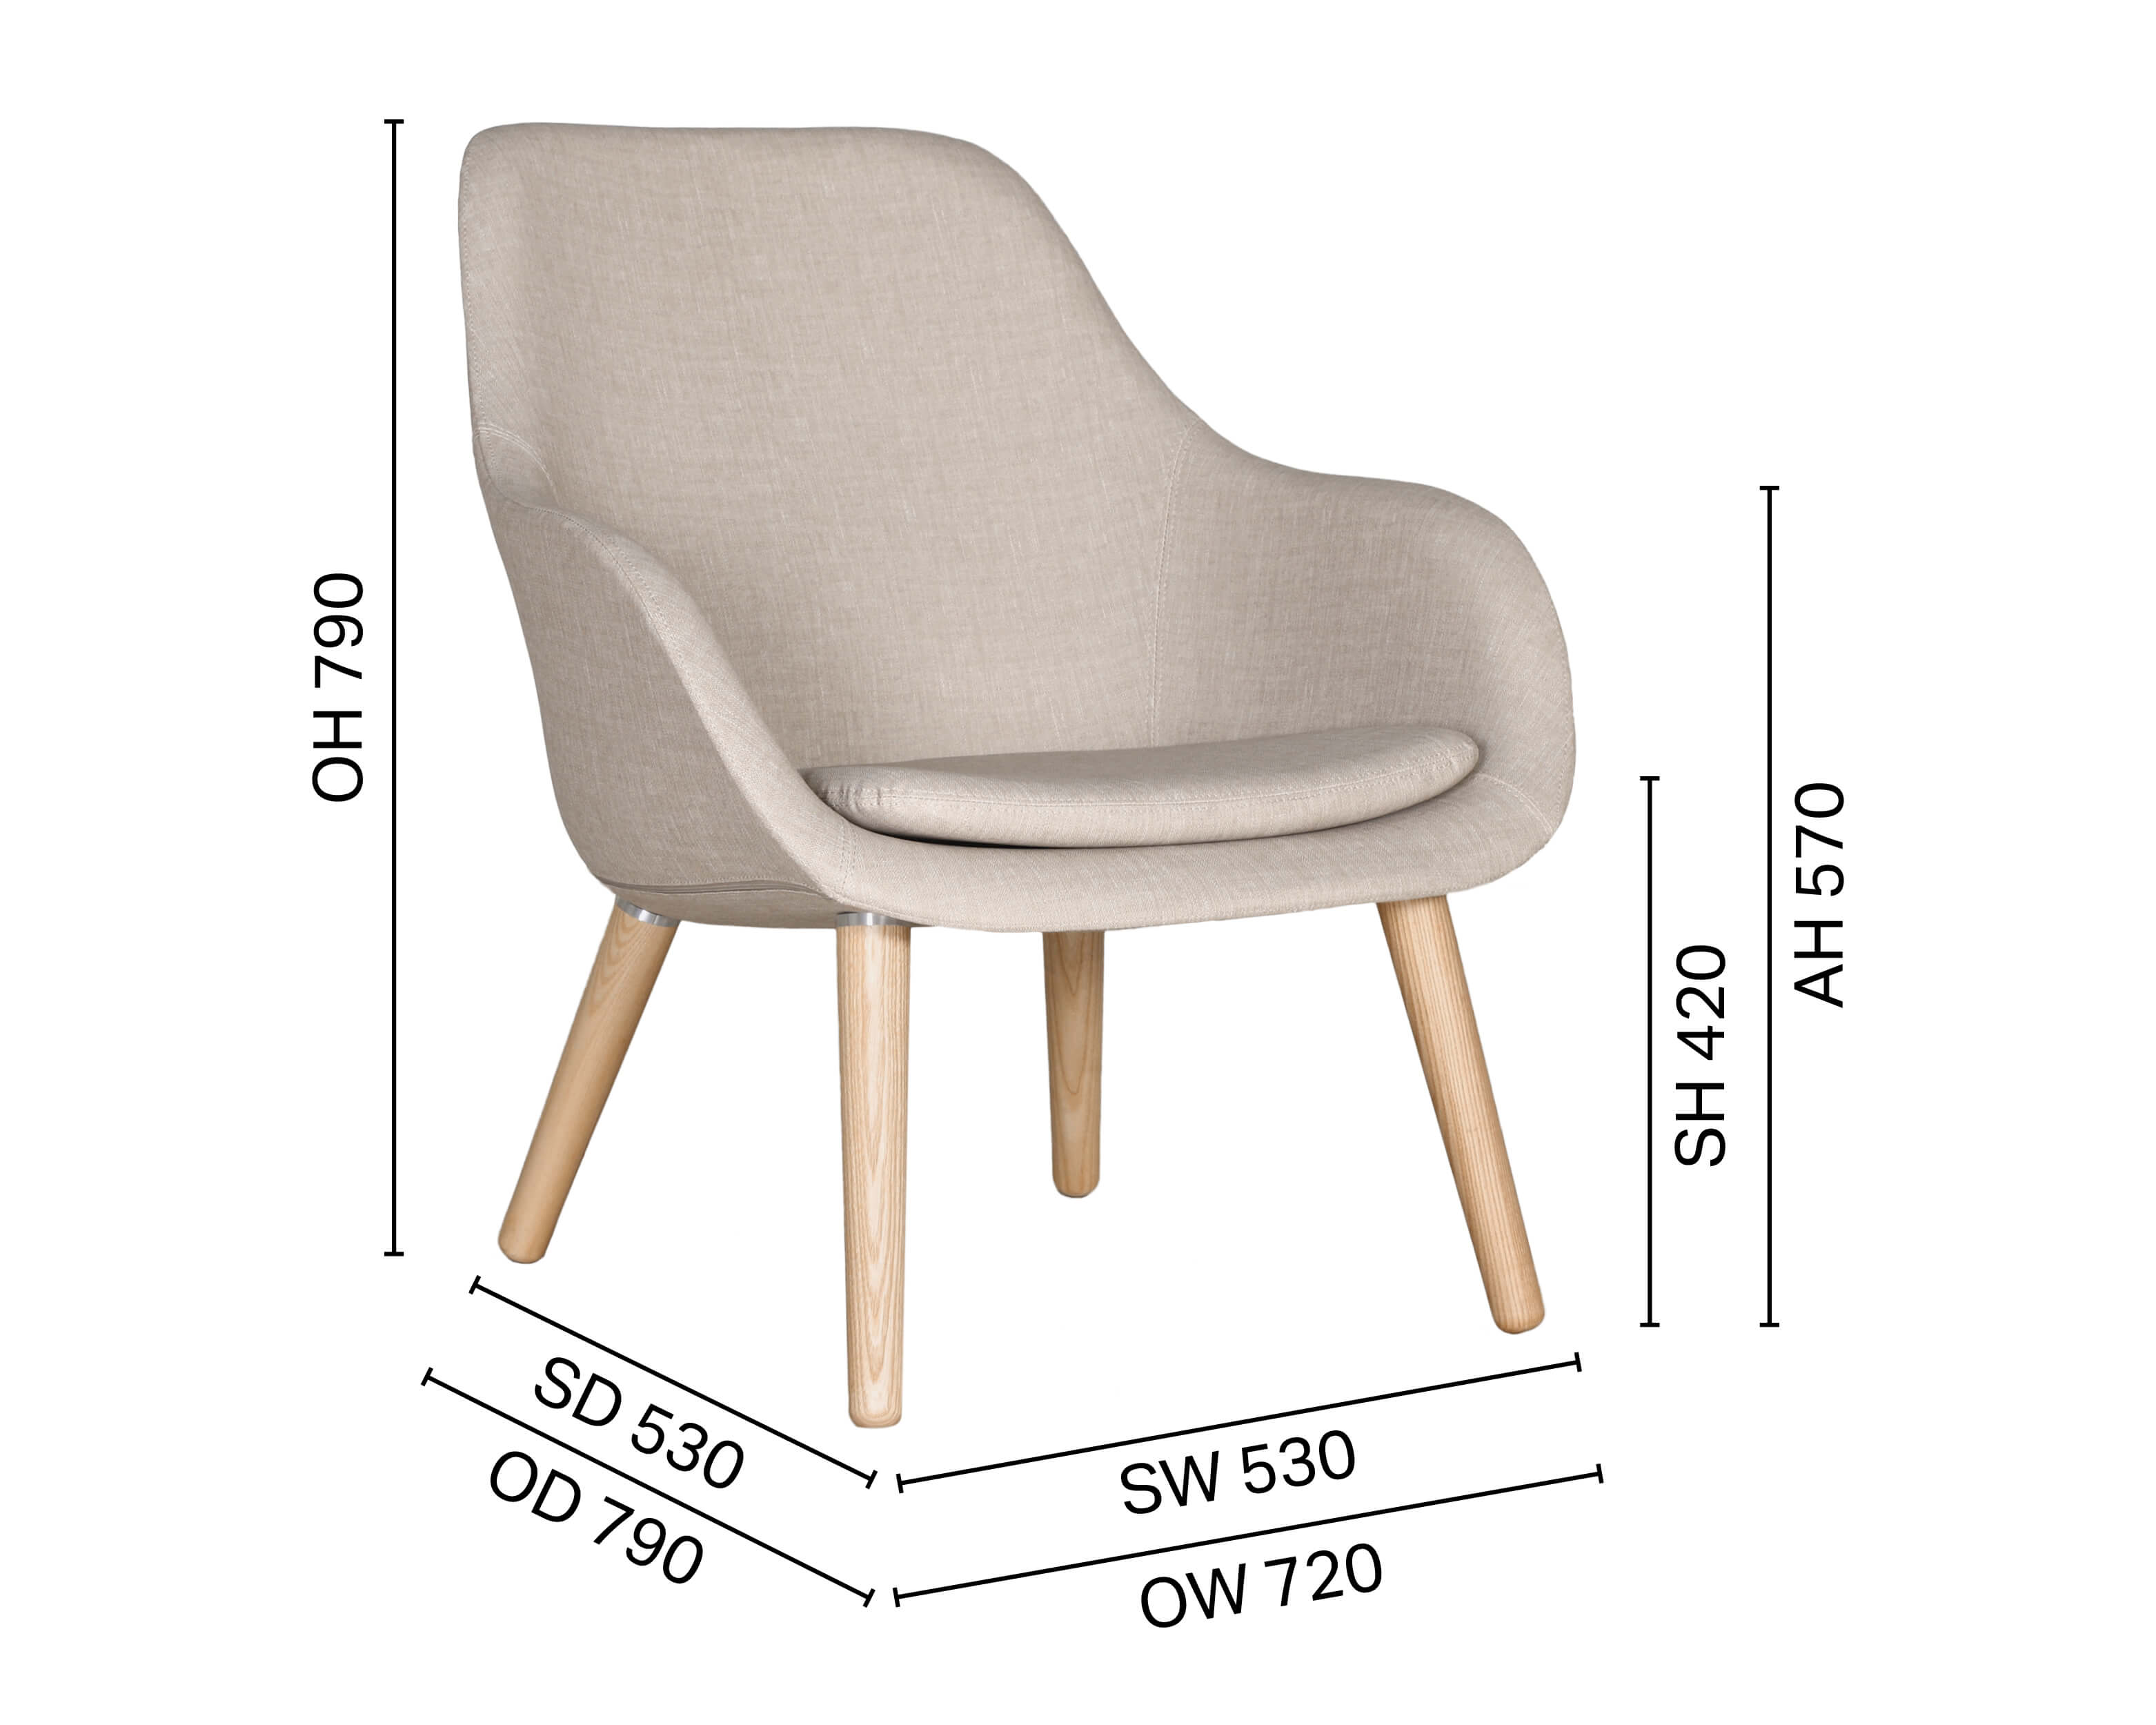 Sacco Wood Leg Lounger